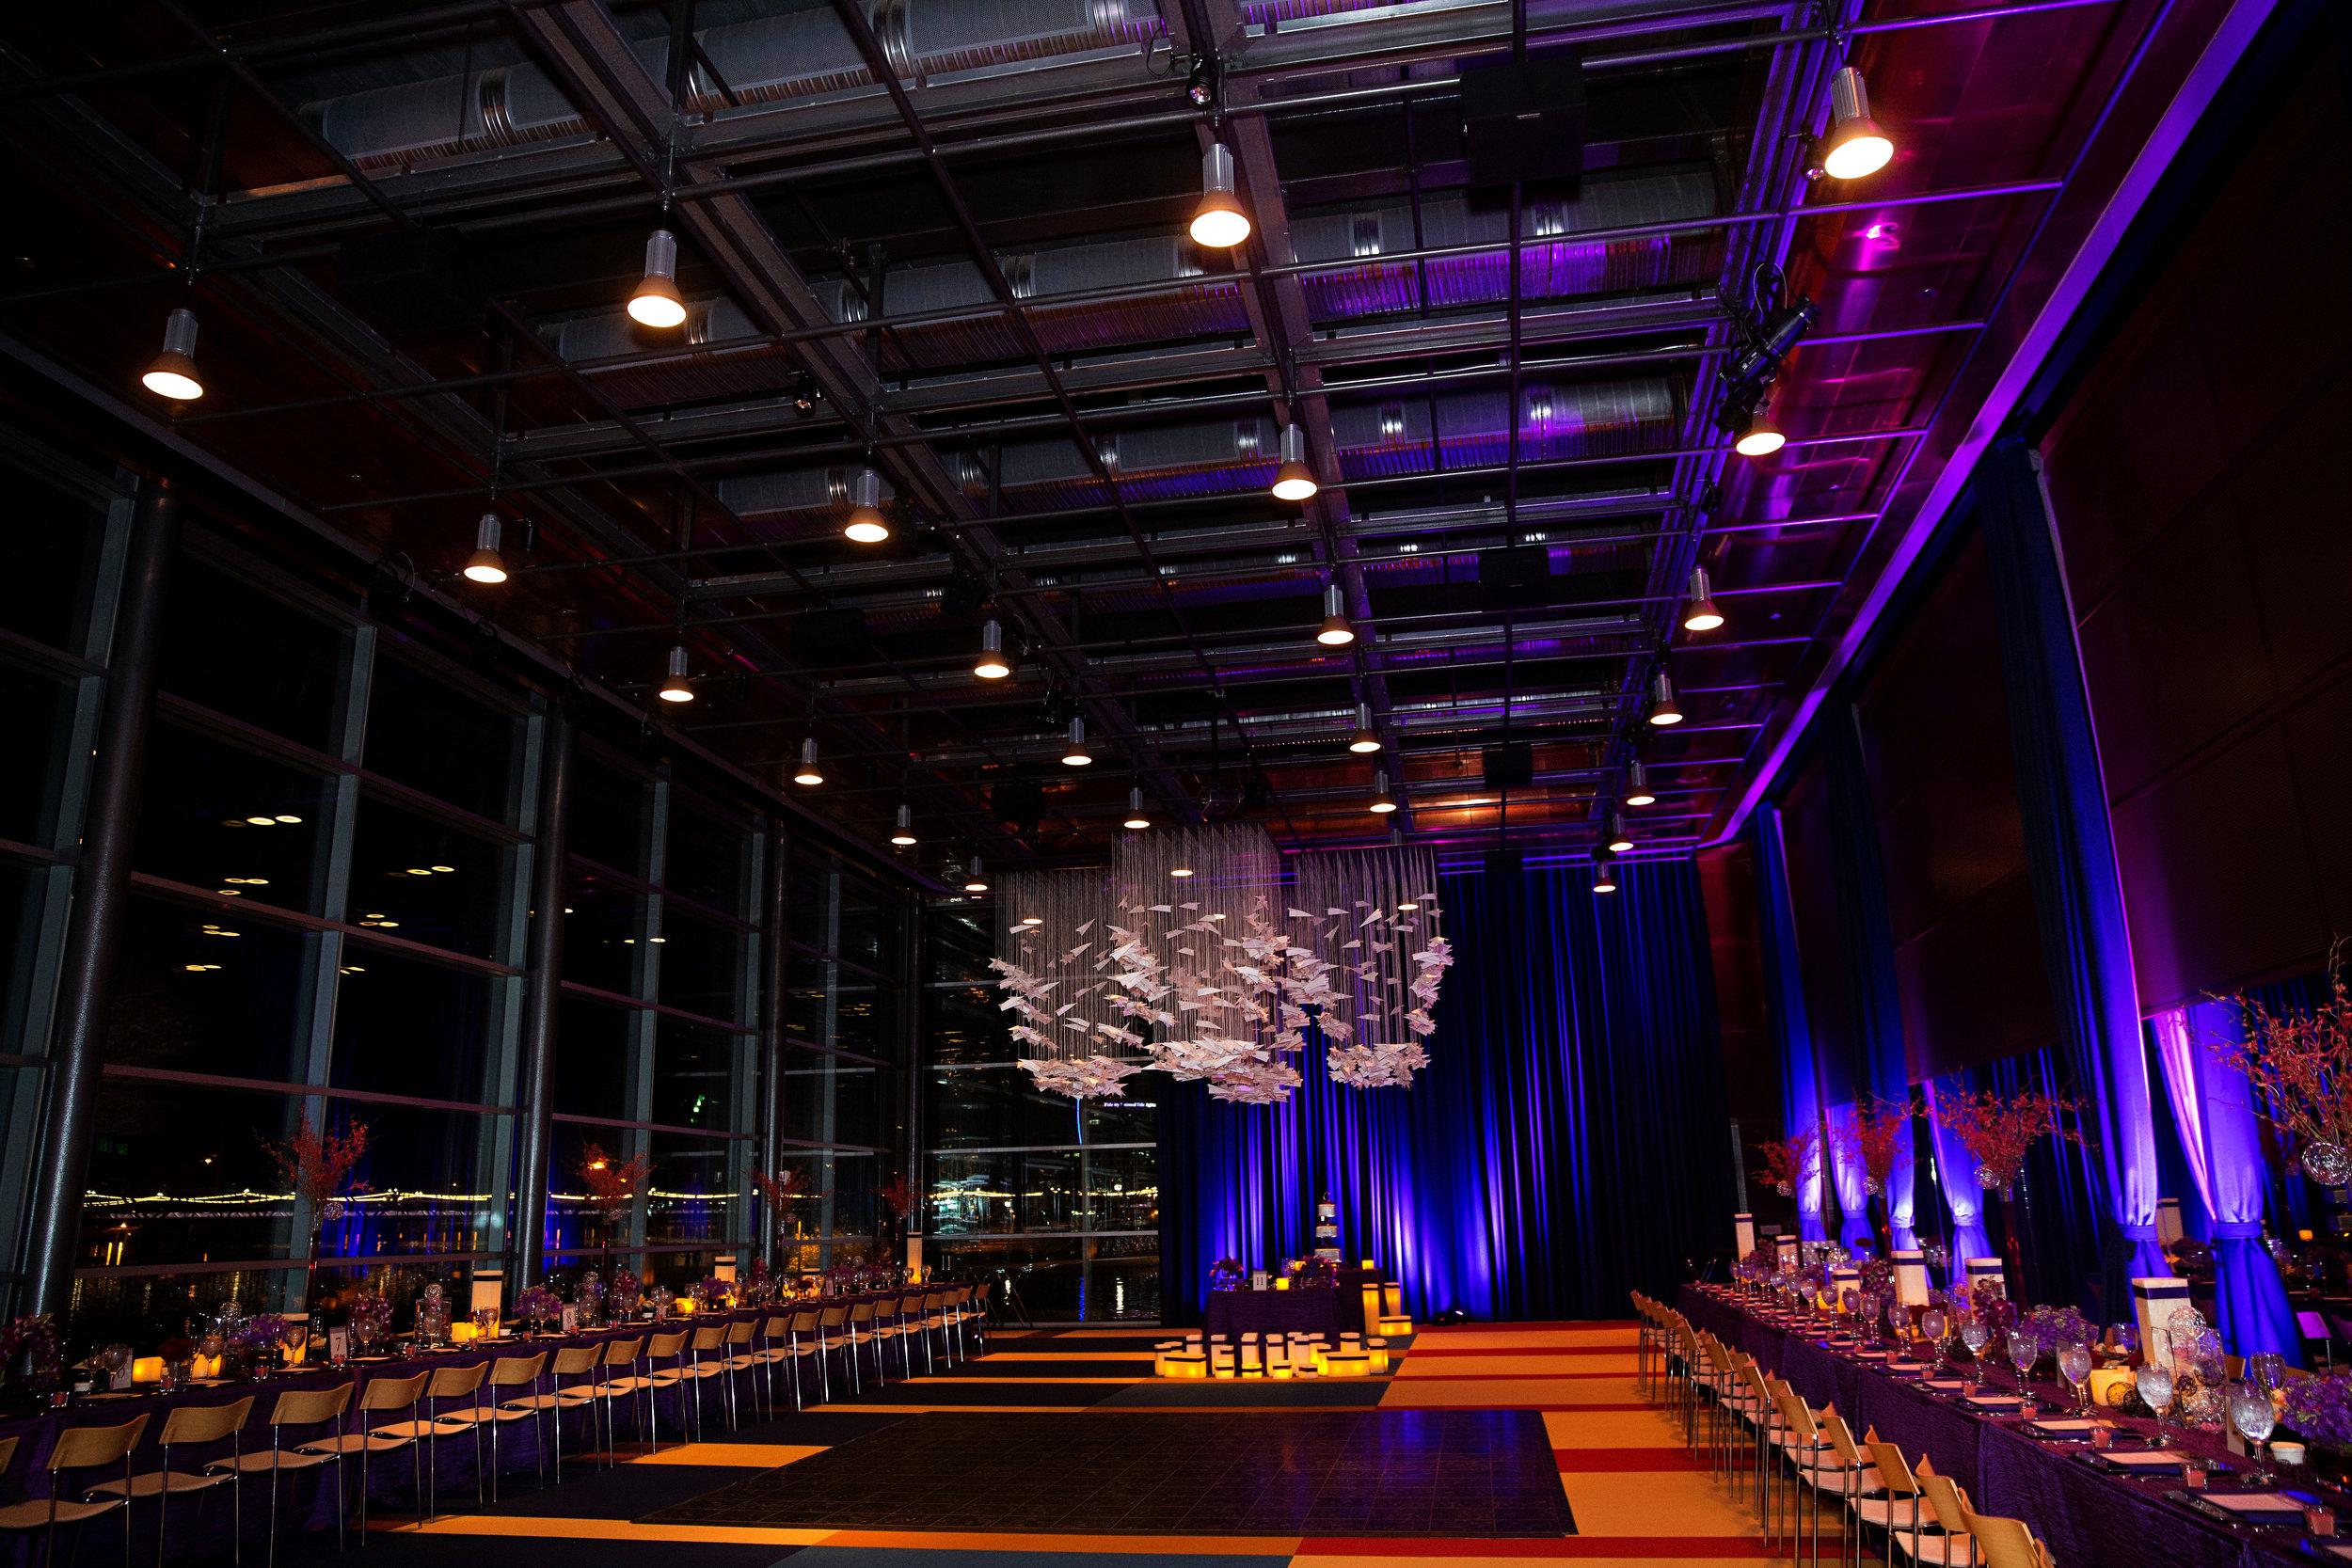 18 unique wedding reception large wedding reception hall purple reception all purple wedding decor O Grace Photography Life Design Events.jpg